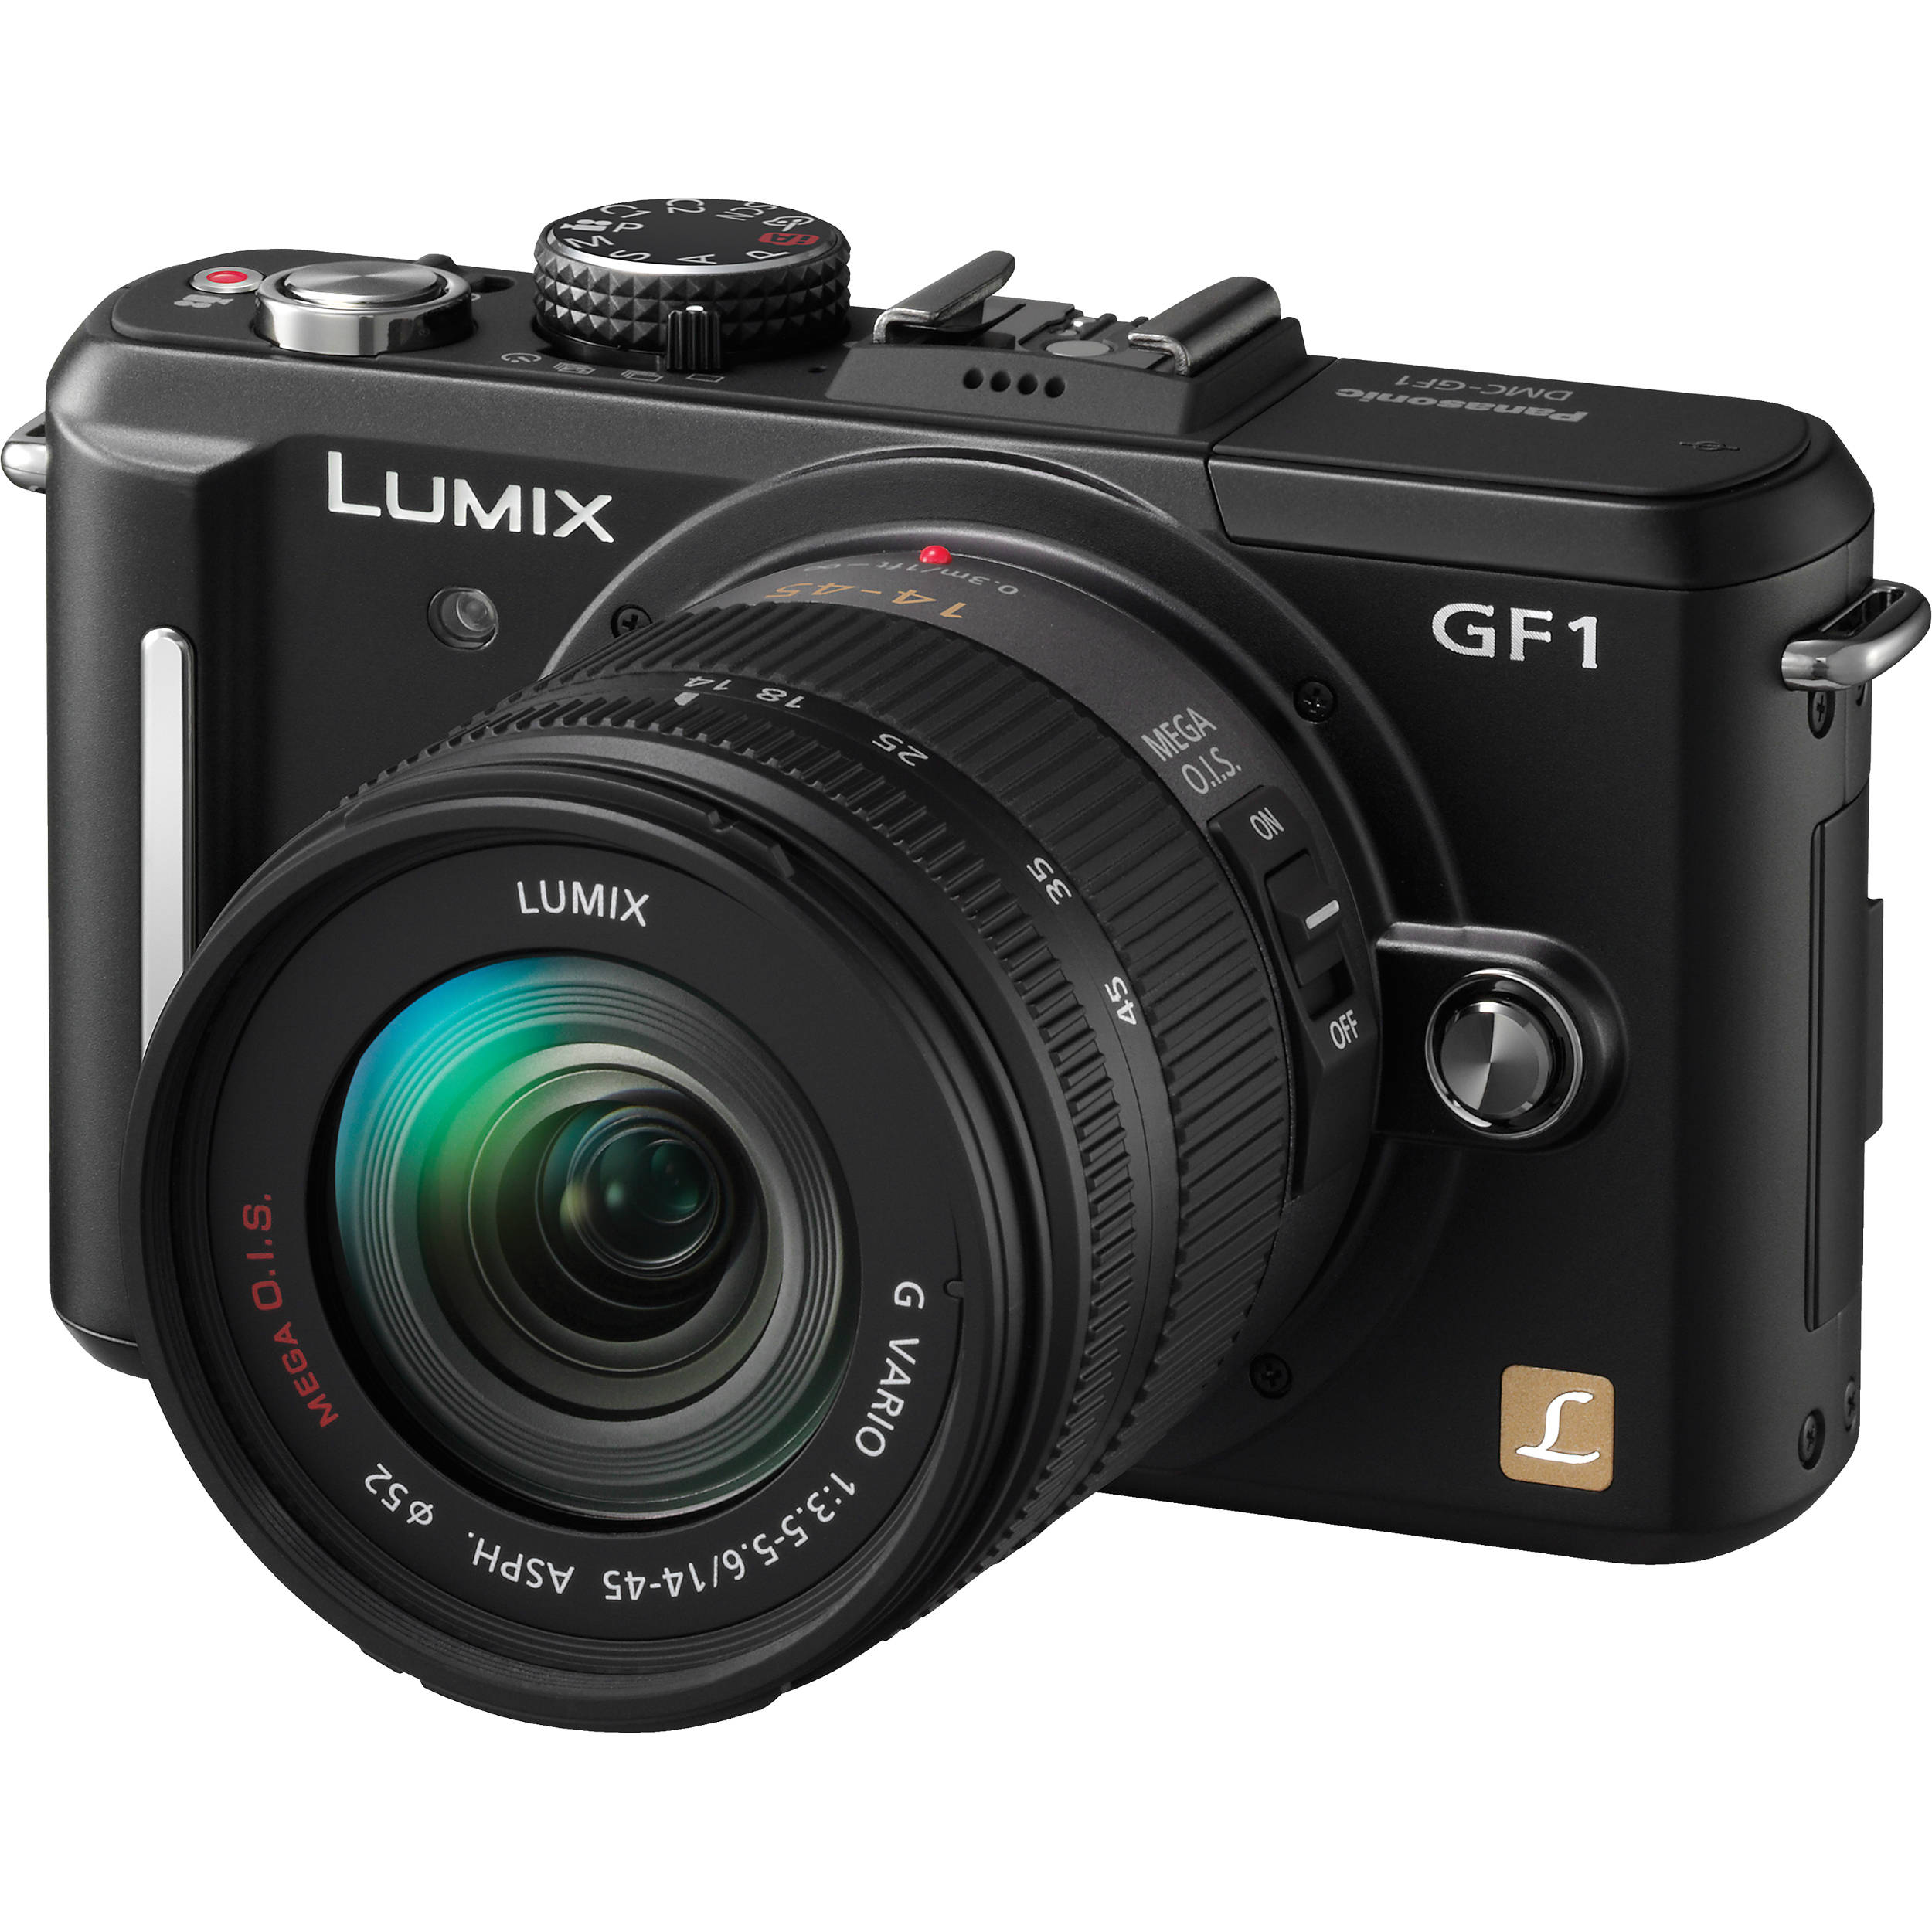 panasonic lumix dmc gf1 digital camera with 14 45mm dmc gf1k k rh bhphotovideo com panasonic lumix gf1 manual pdf panasonic lumix gf1 manual